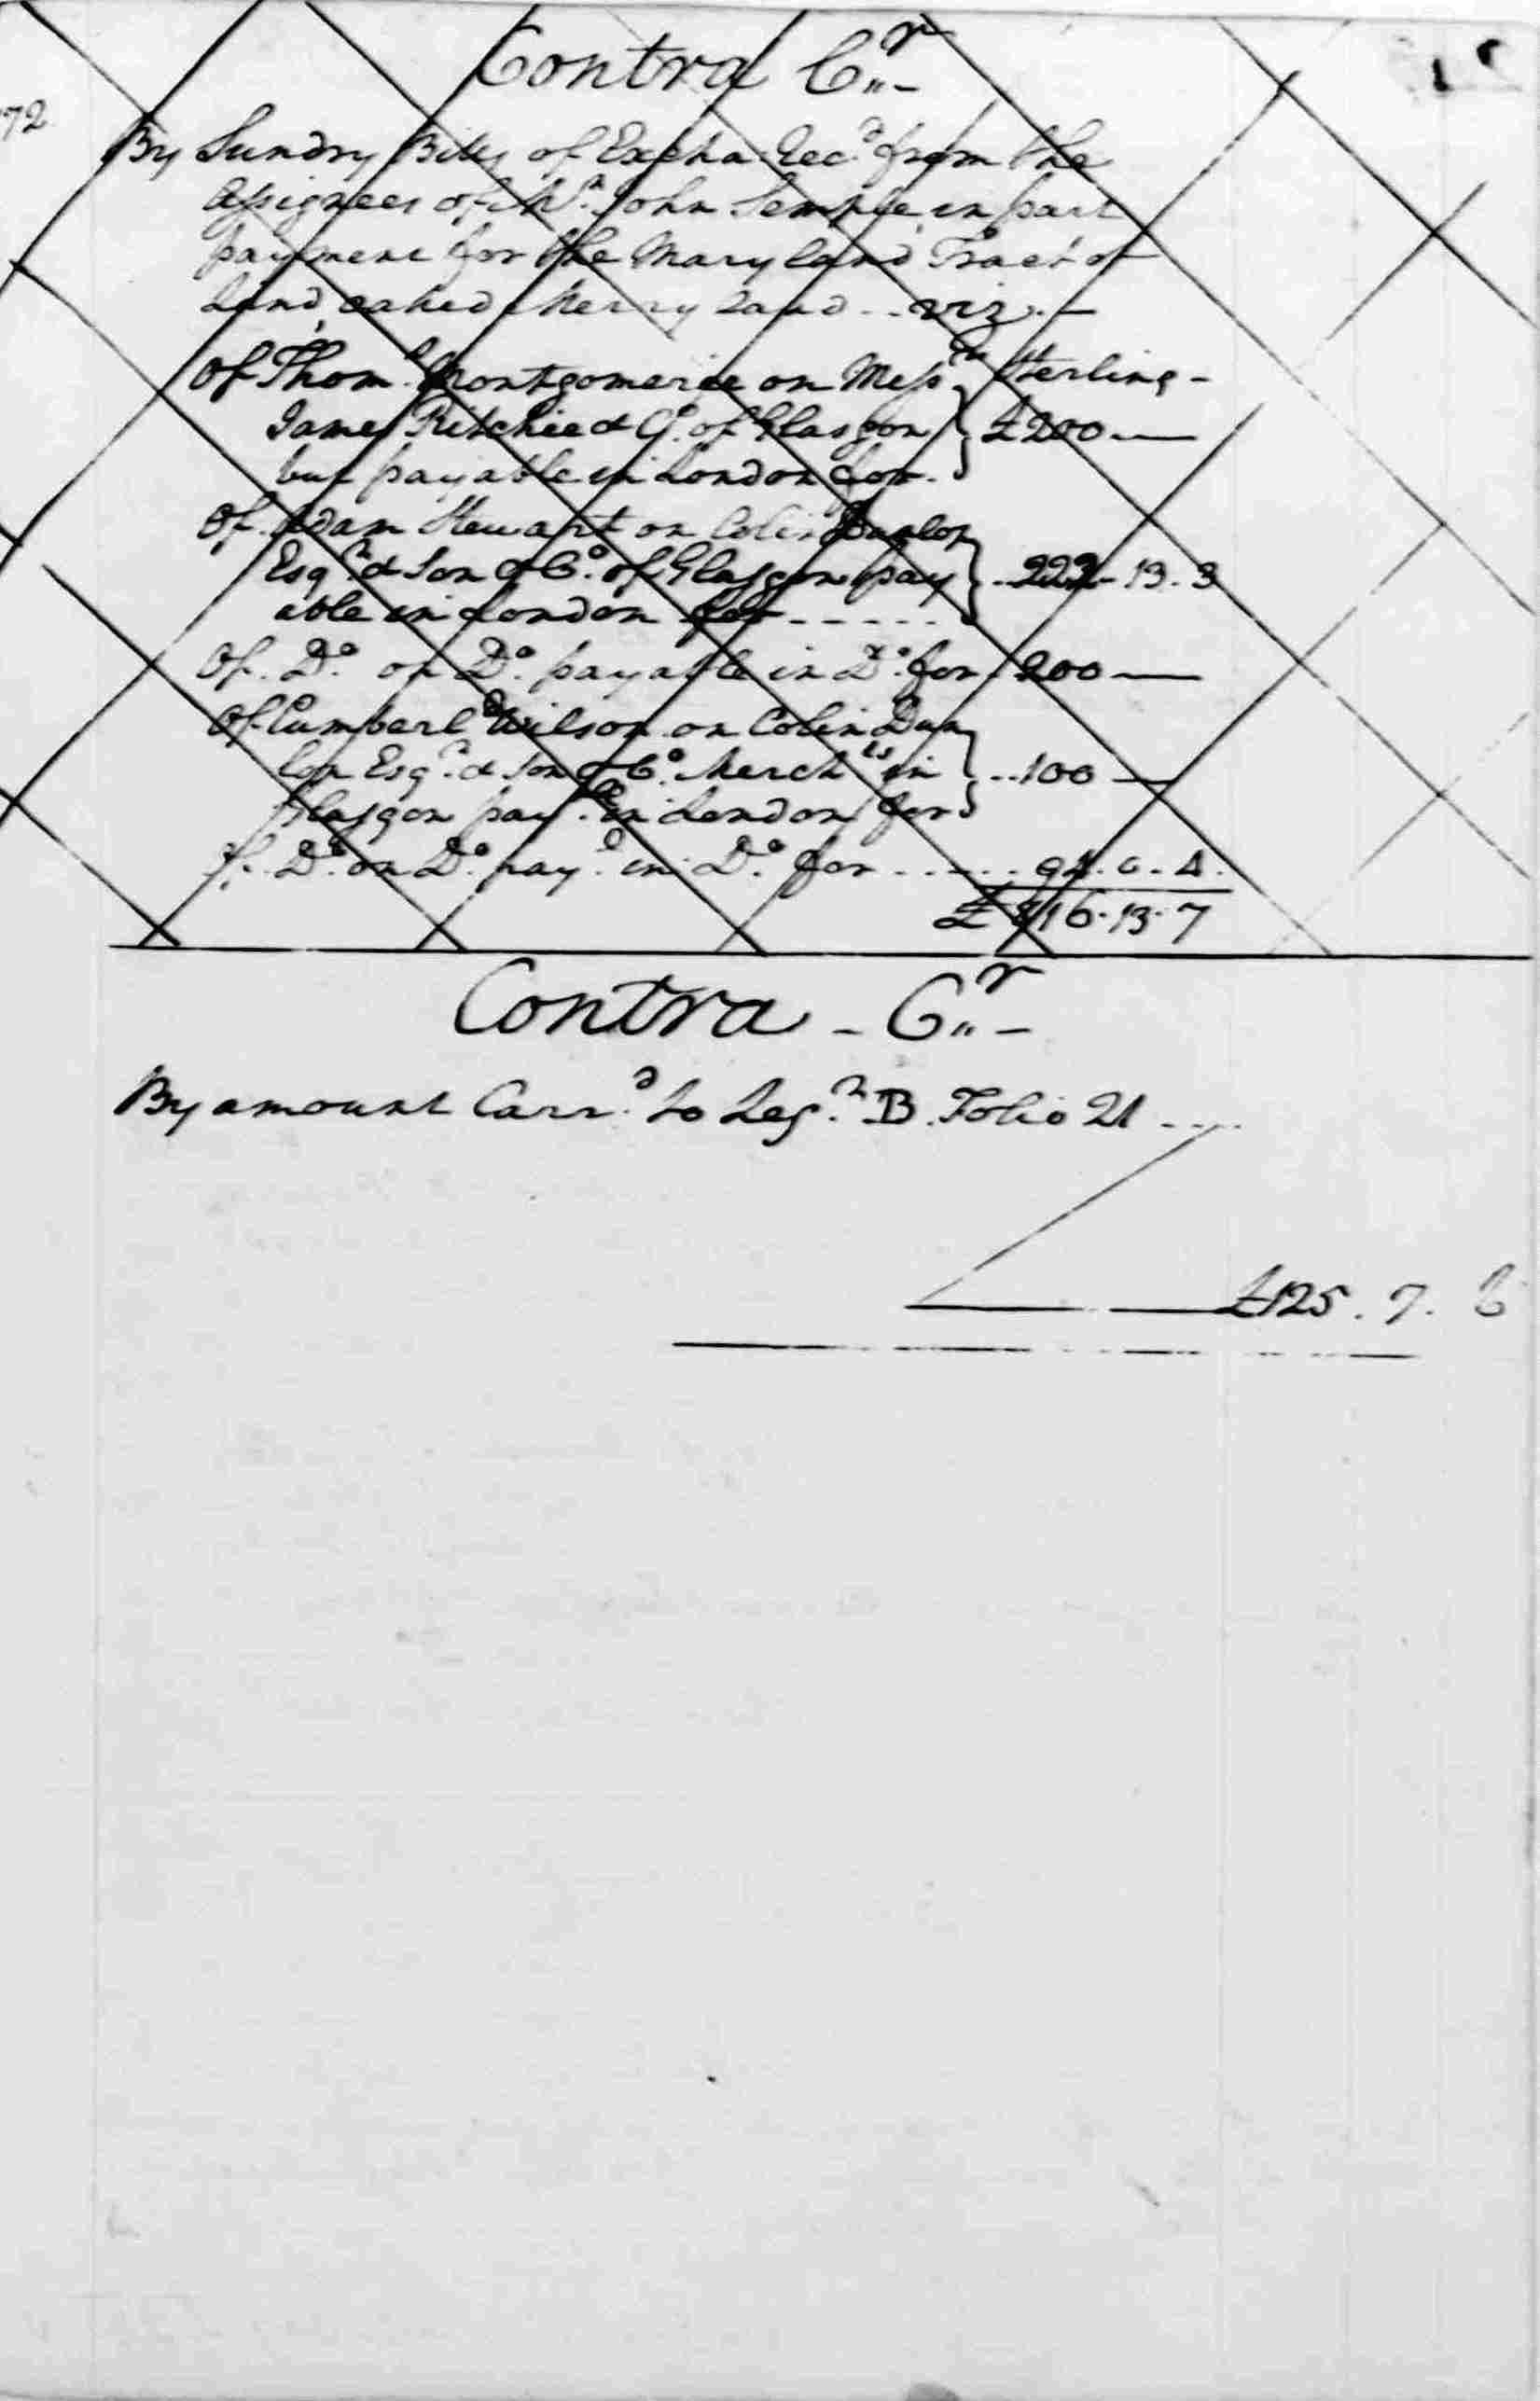 Ledger A, folio 246, right side